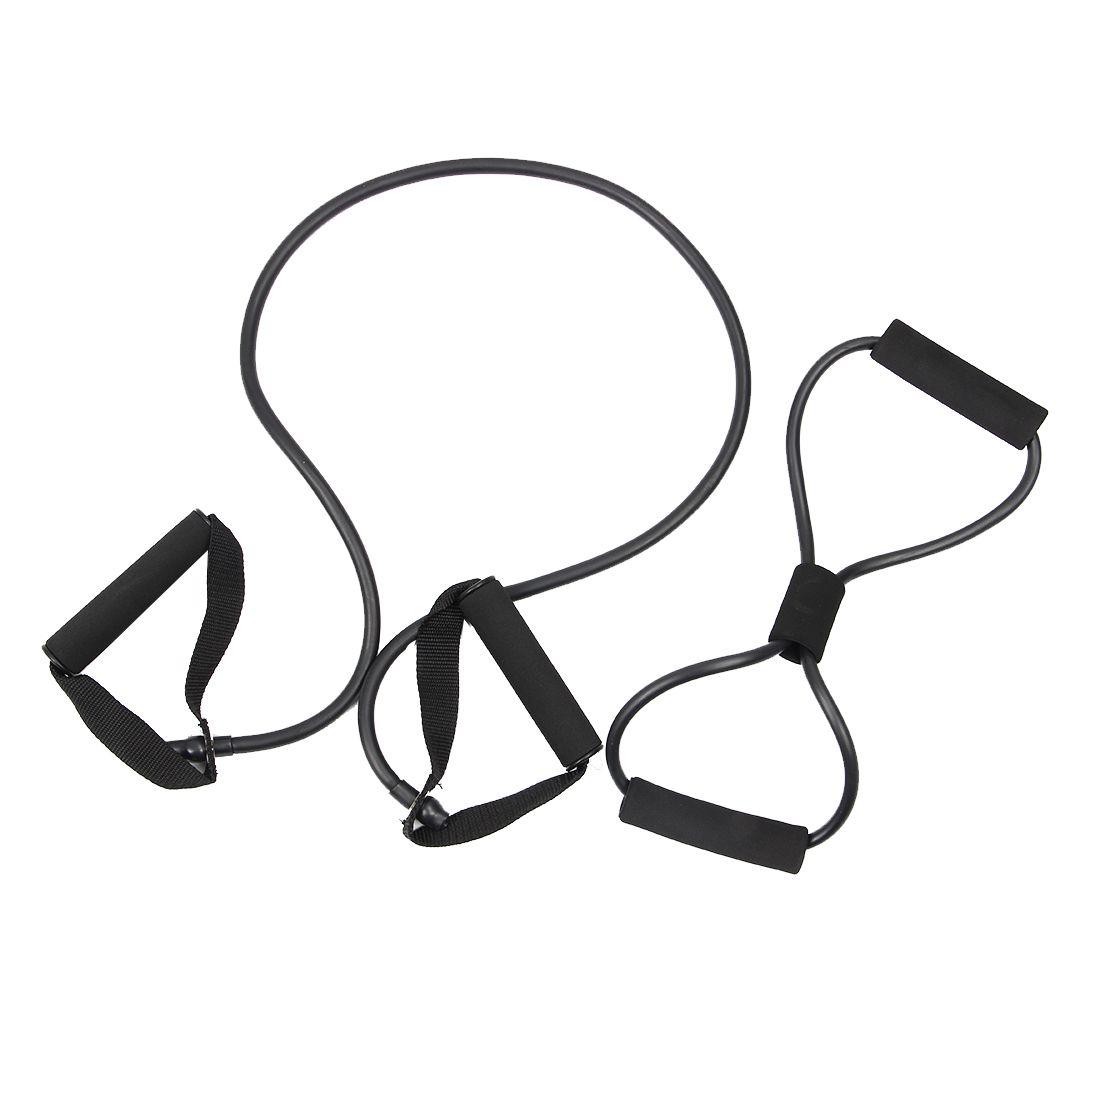 2 stücke Widerstand bands brust entwickler expander Übung Tubes, yoga Rohr Ausbildung Seil frühling exerciser Widerstand rohr